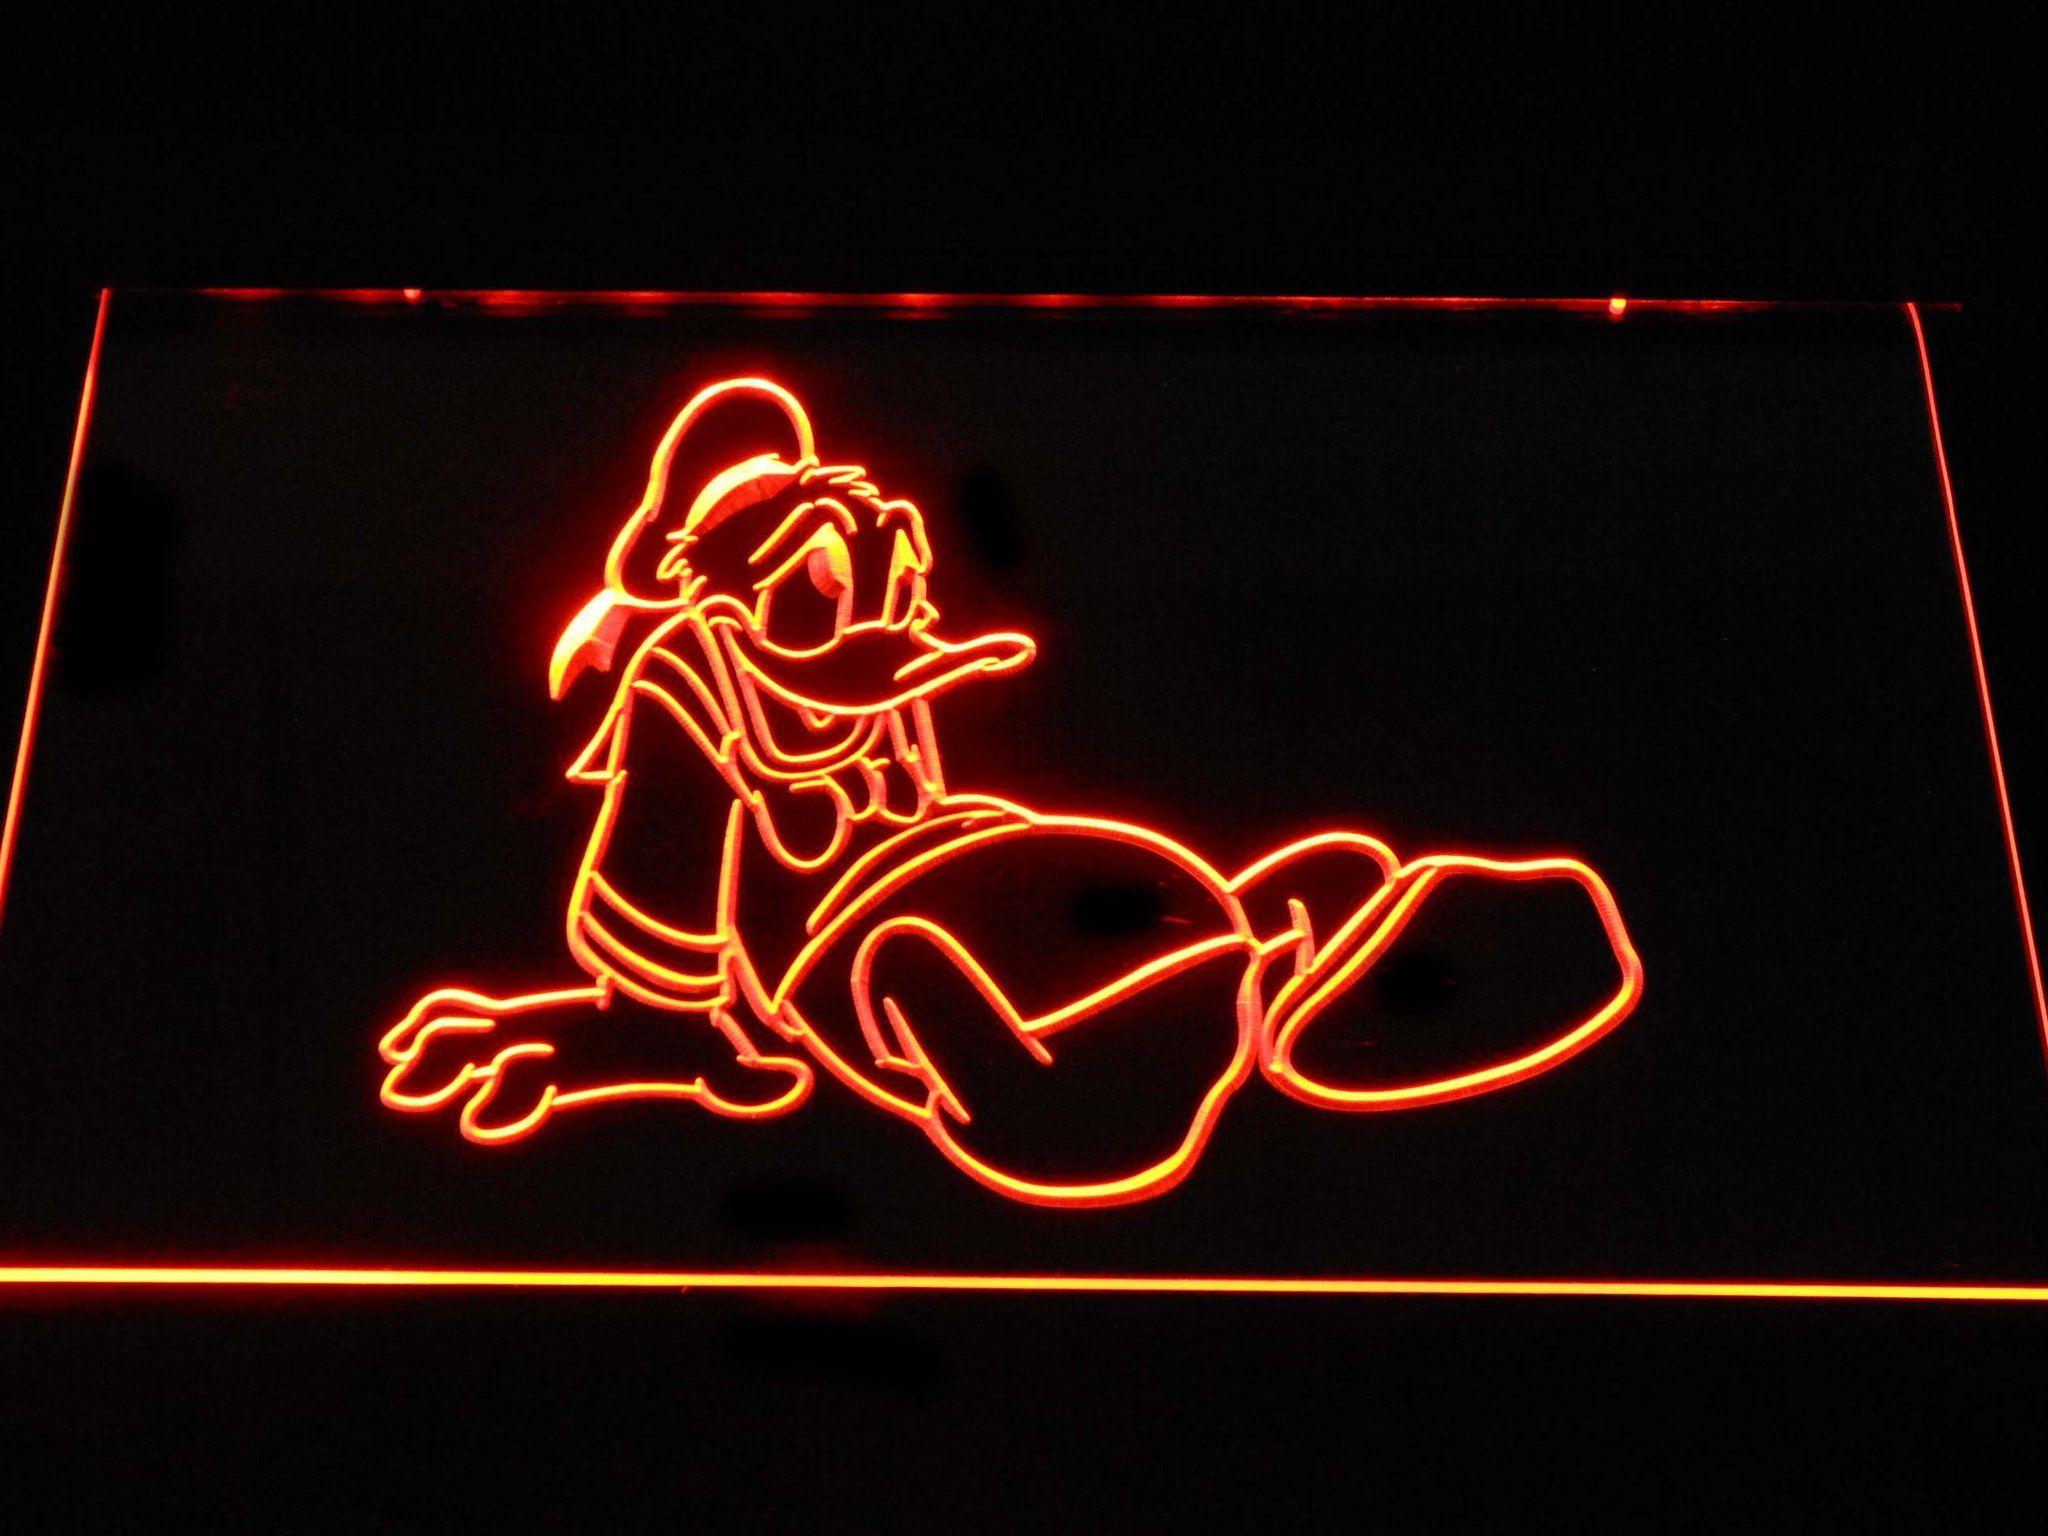 Disney Donald Duck Slump LED Neon Sign g374 12 Neon